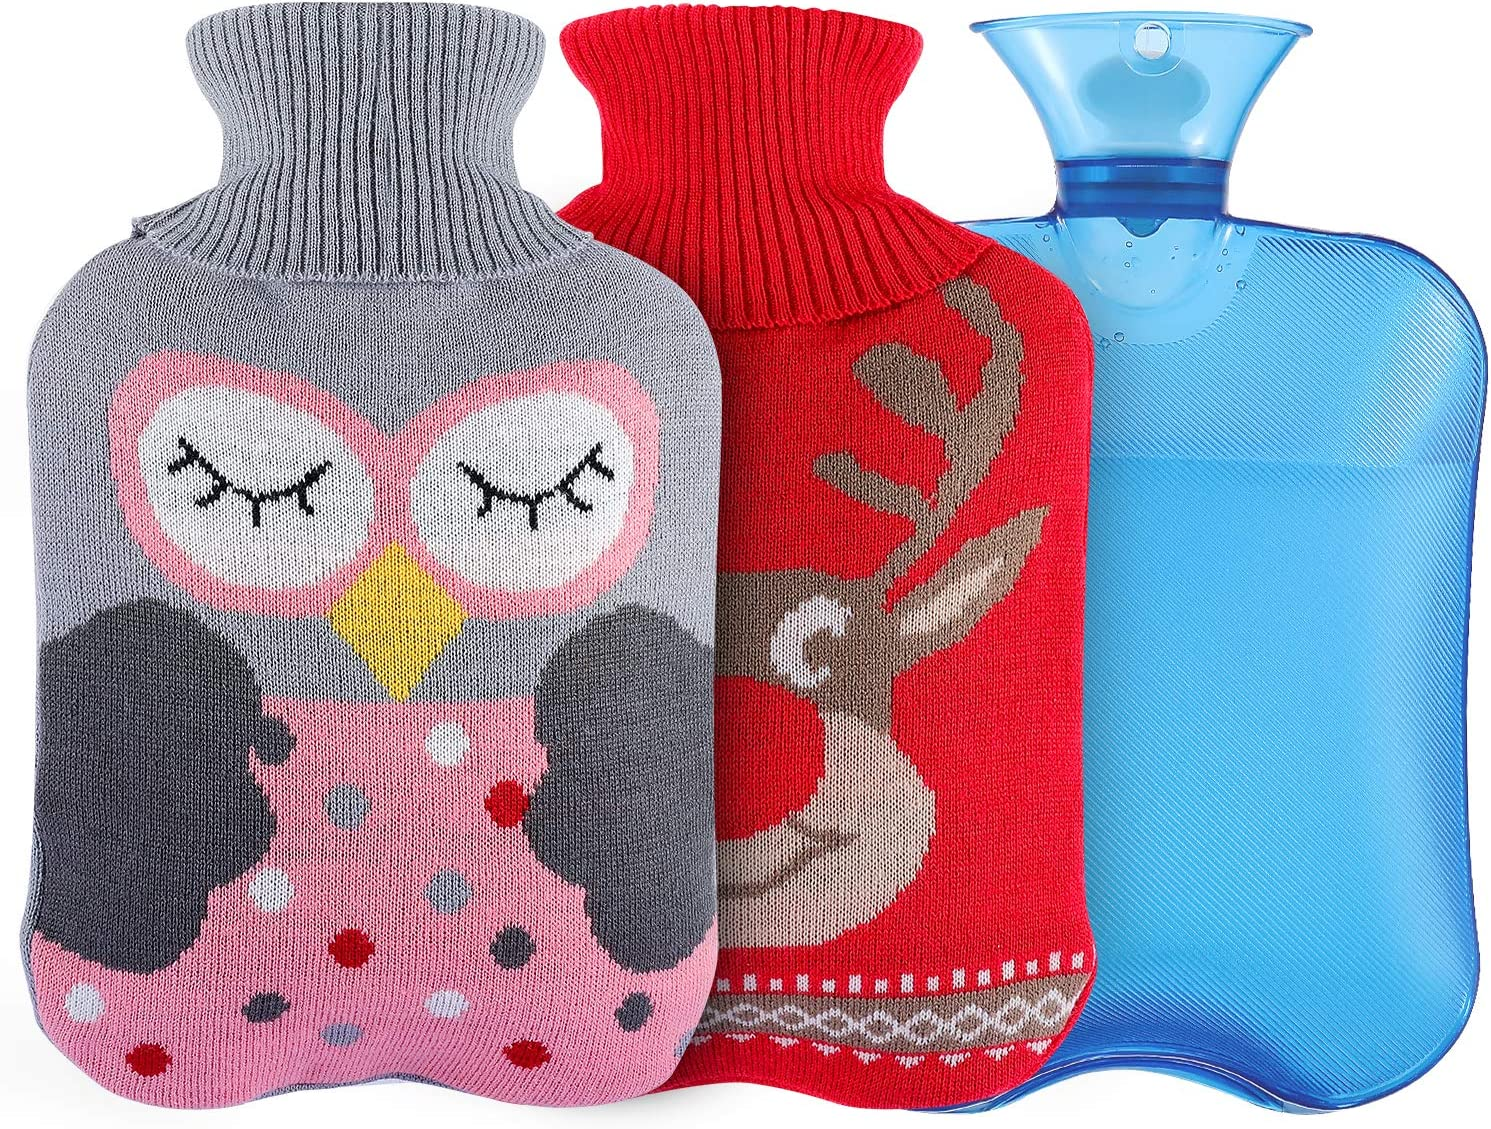 Bolsa de Agua CalienteBolsa de Agua Calient,Natural Goma Botellas,con Tejida Caso Hecho Punto Bolsa Para Mantener el Agua Calient